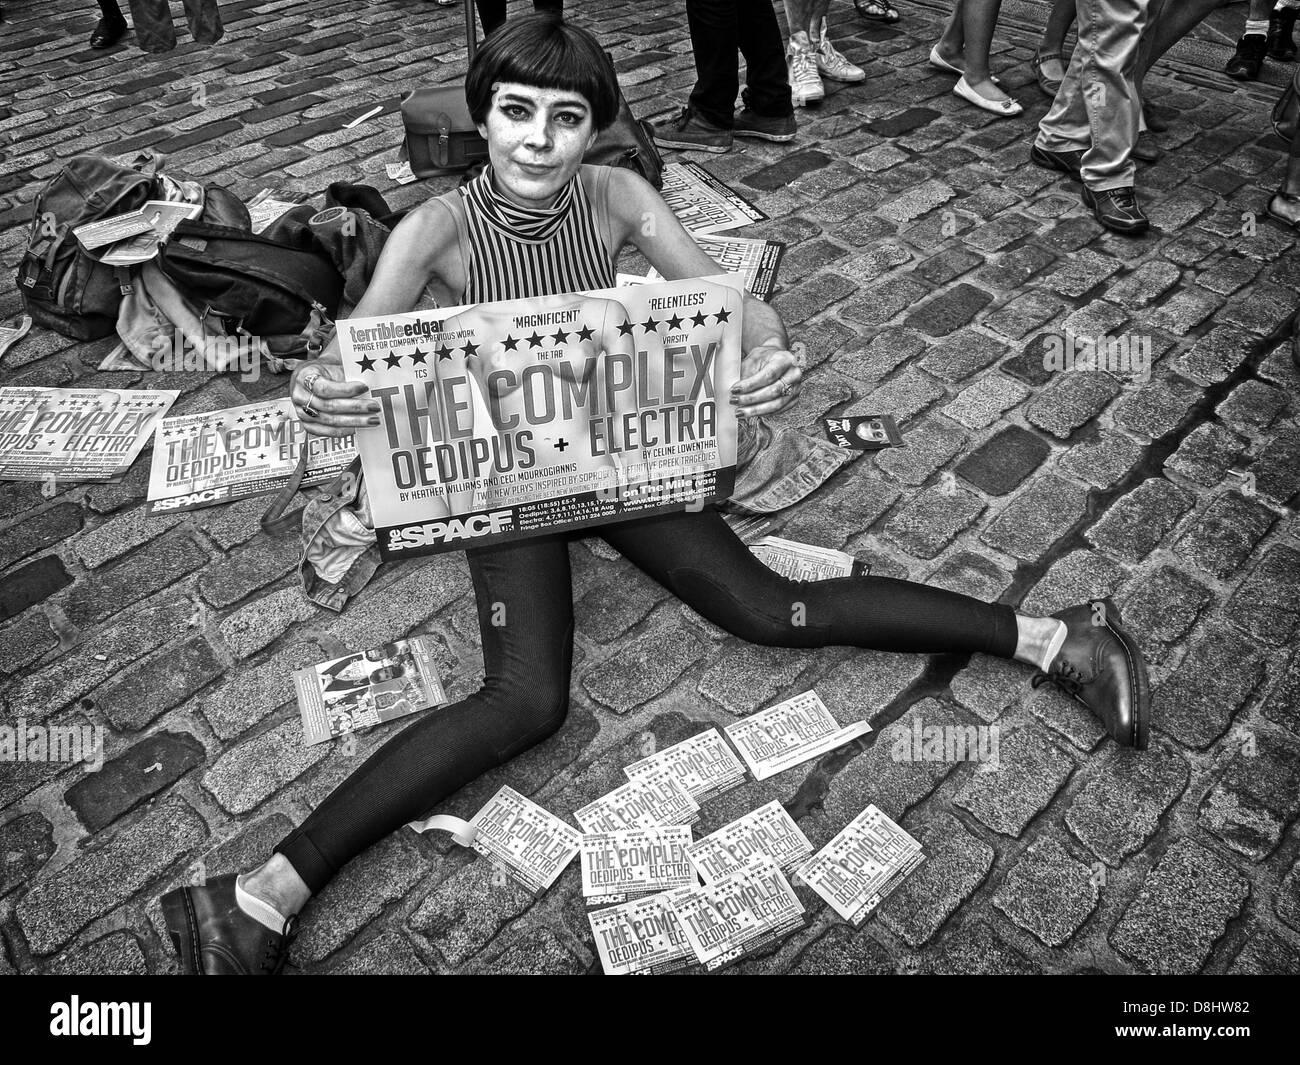 Laden Sie dieses Alamy Stockfoto Edinburgh Festival Fringe handeln, Schottland, UK, EH1 1QS - D8HW82